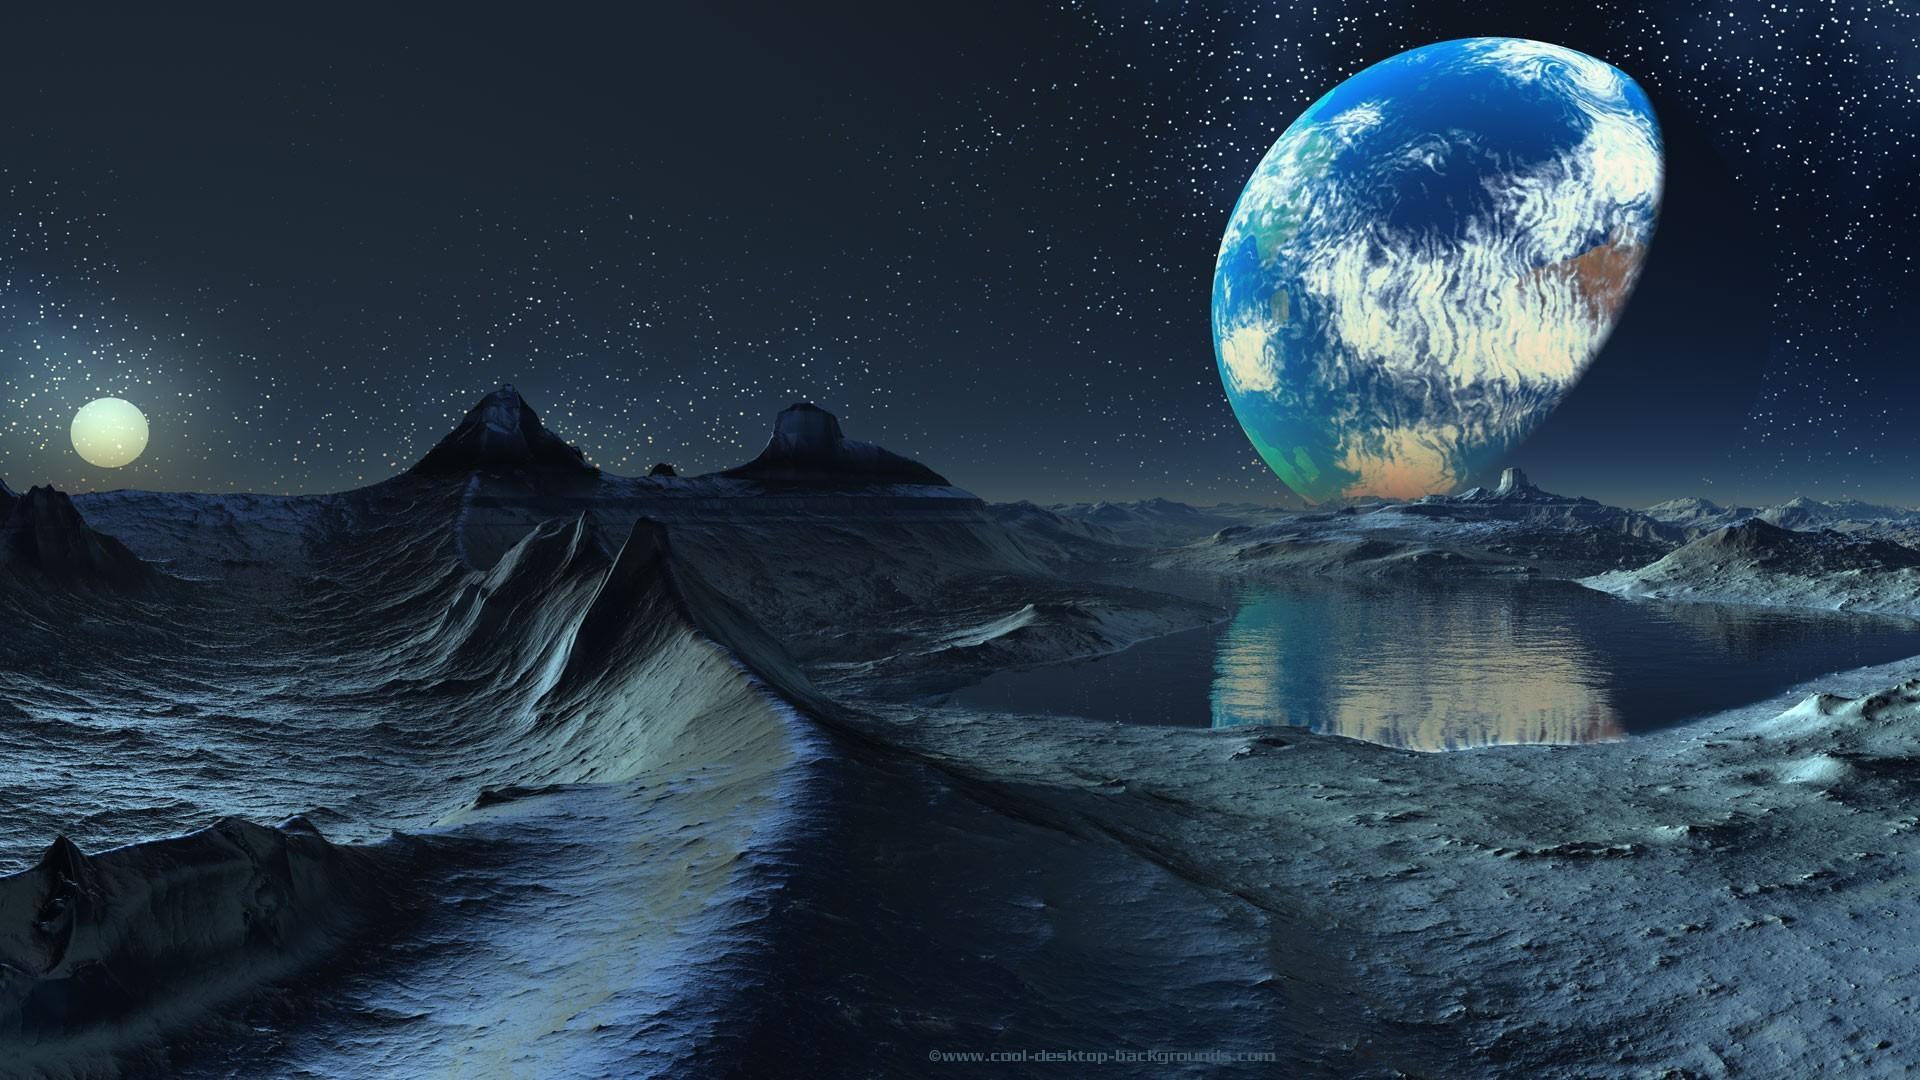 Res: 1920x1080, Space dawn planets moon fantasy art artwork wallpaper